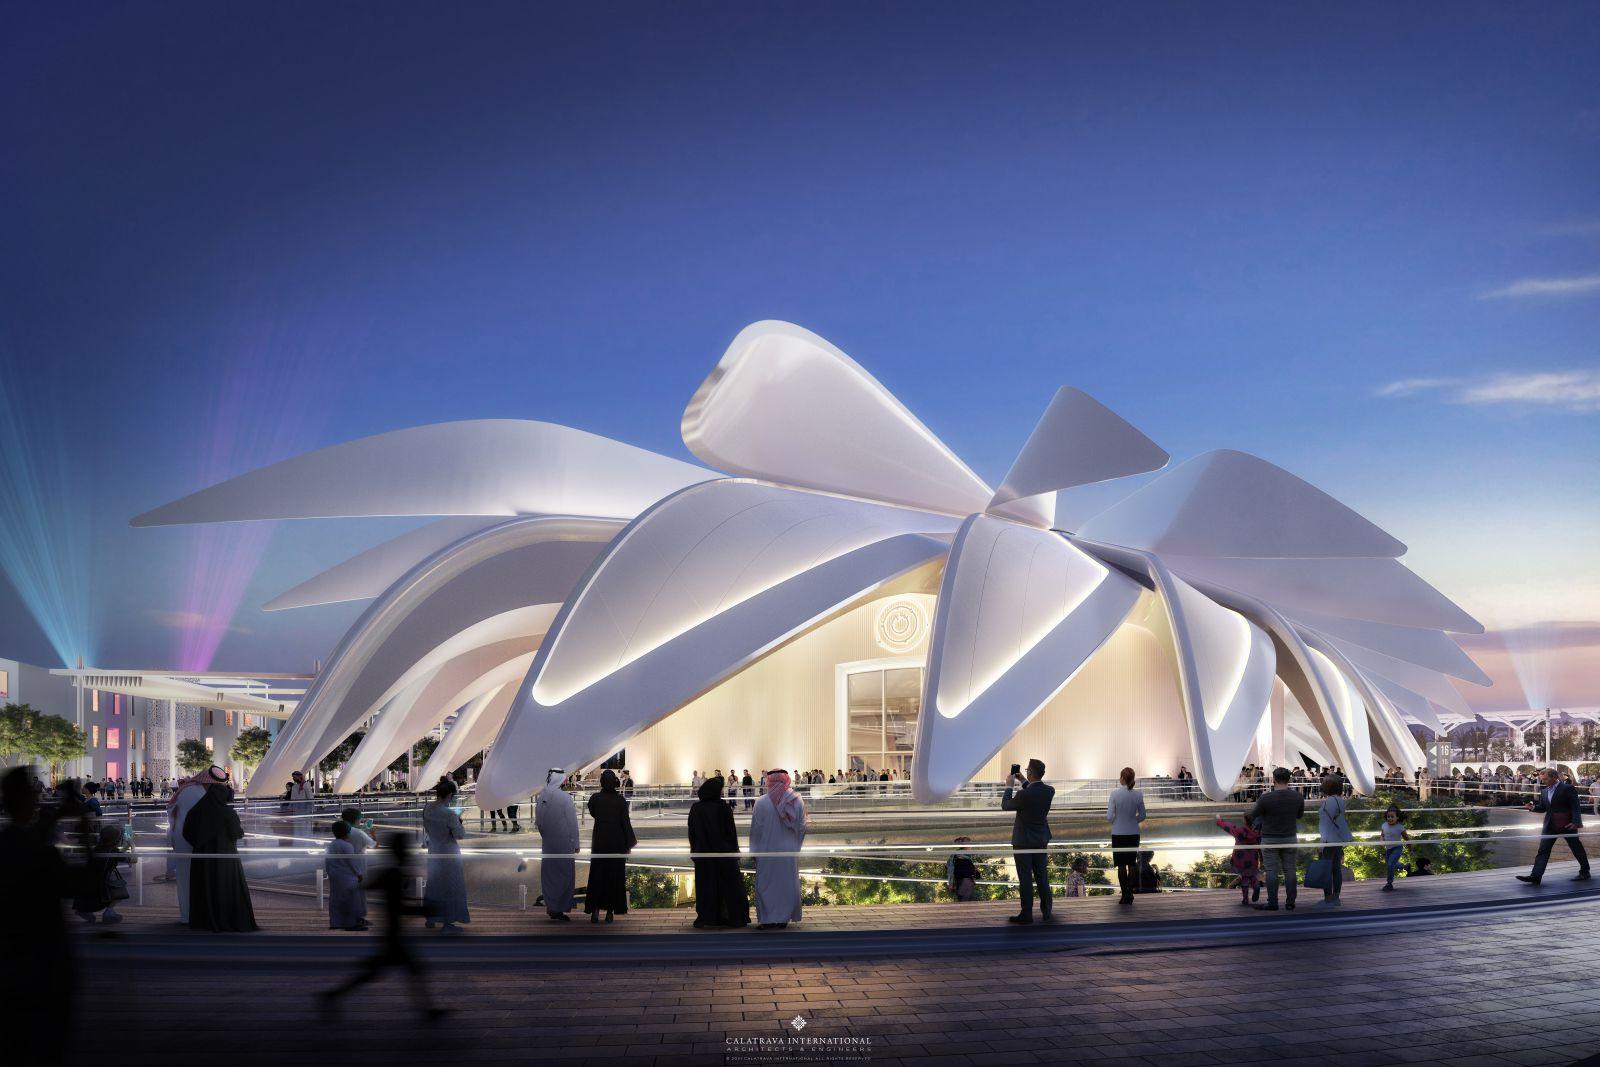 UAE Pavilion at EXPO 2020